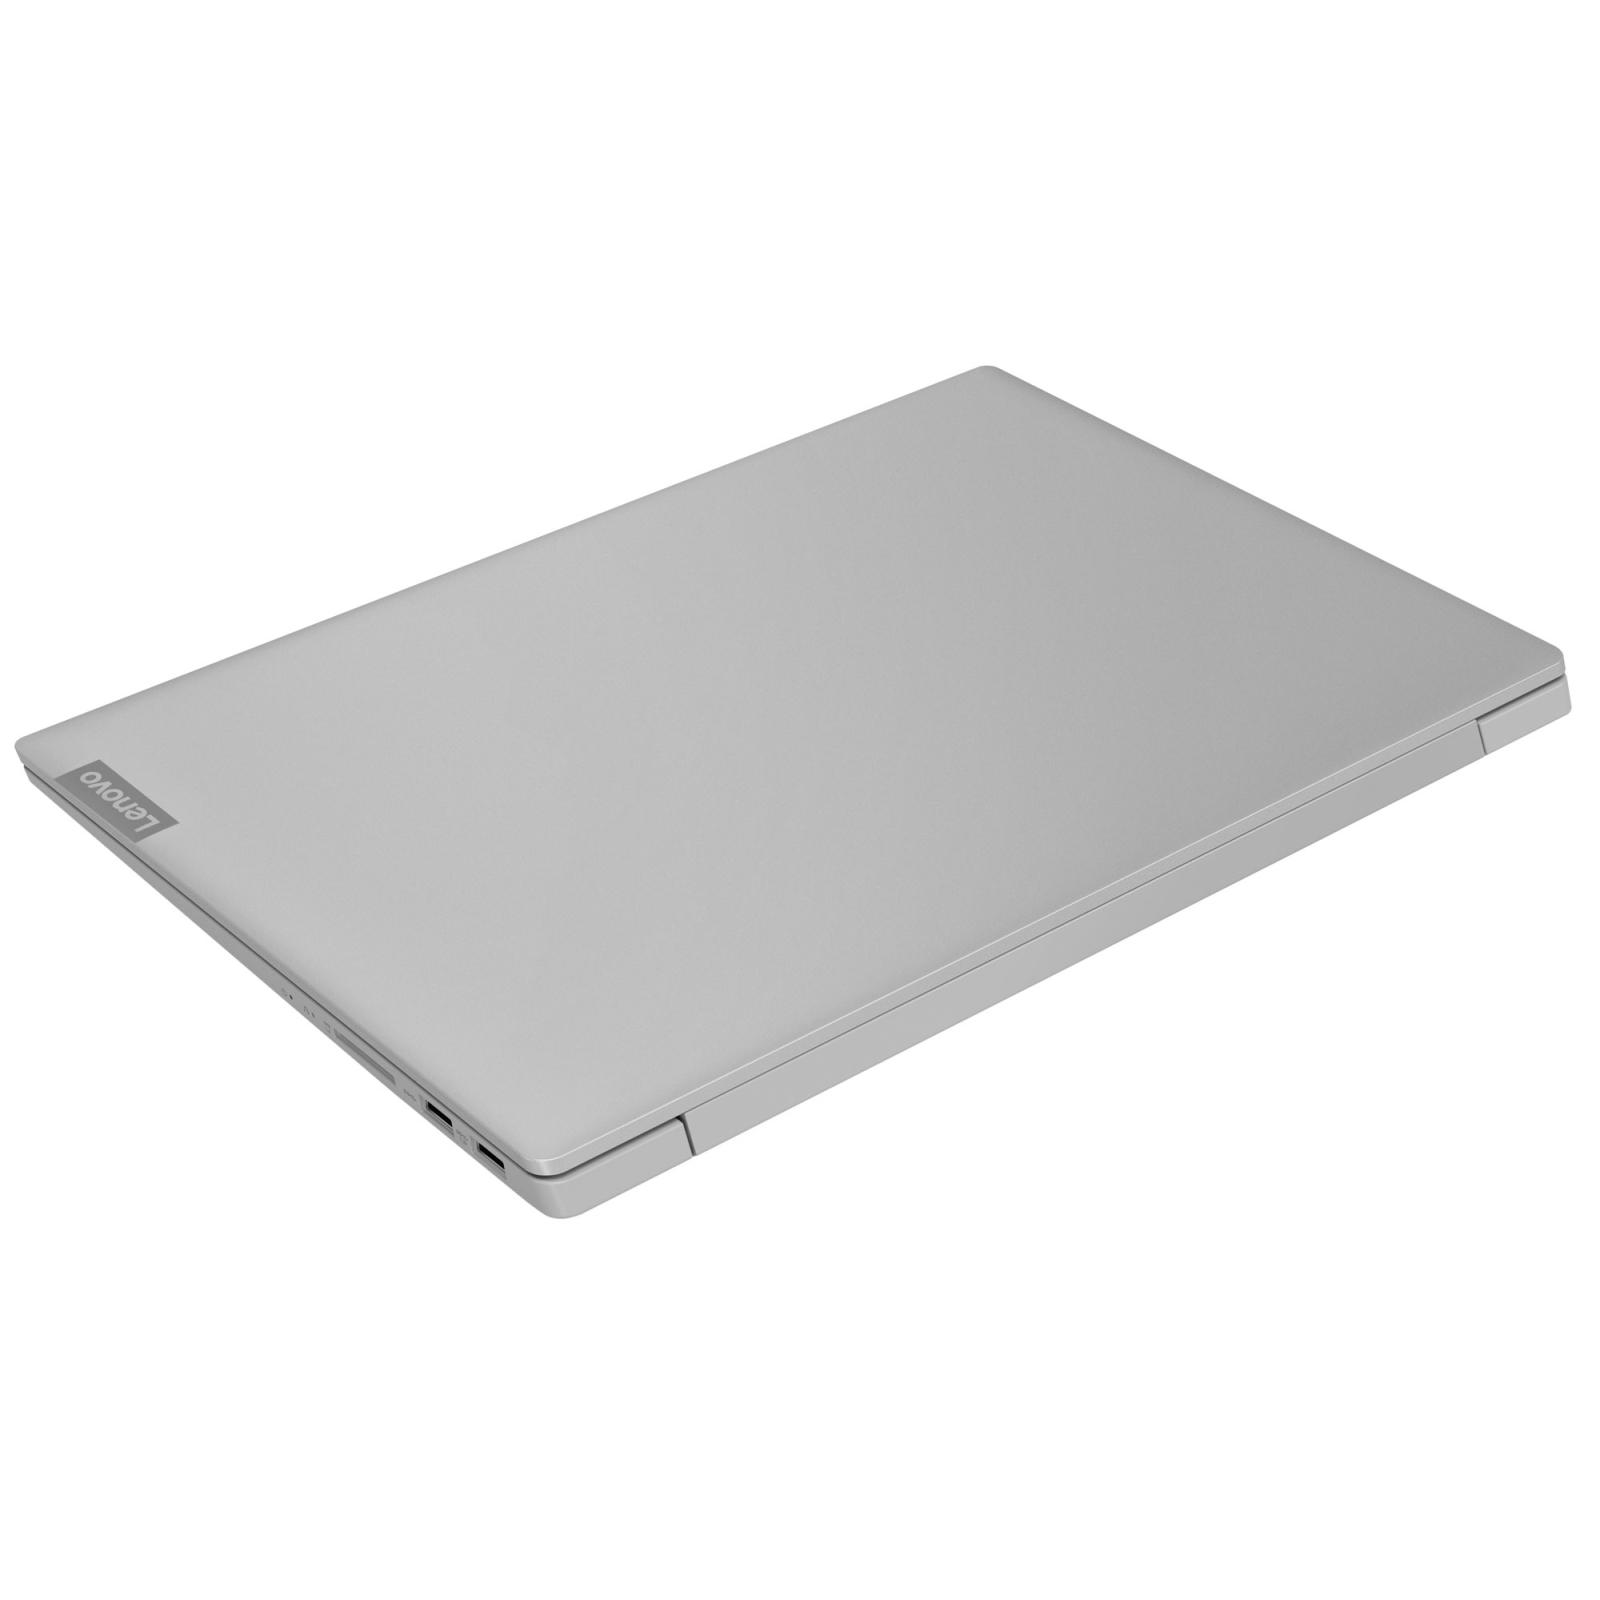 Ноутбук Lenovo IdeaPad S340-15 (81N800Y5RA) изображение 8